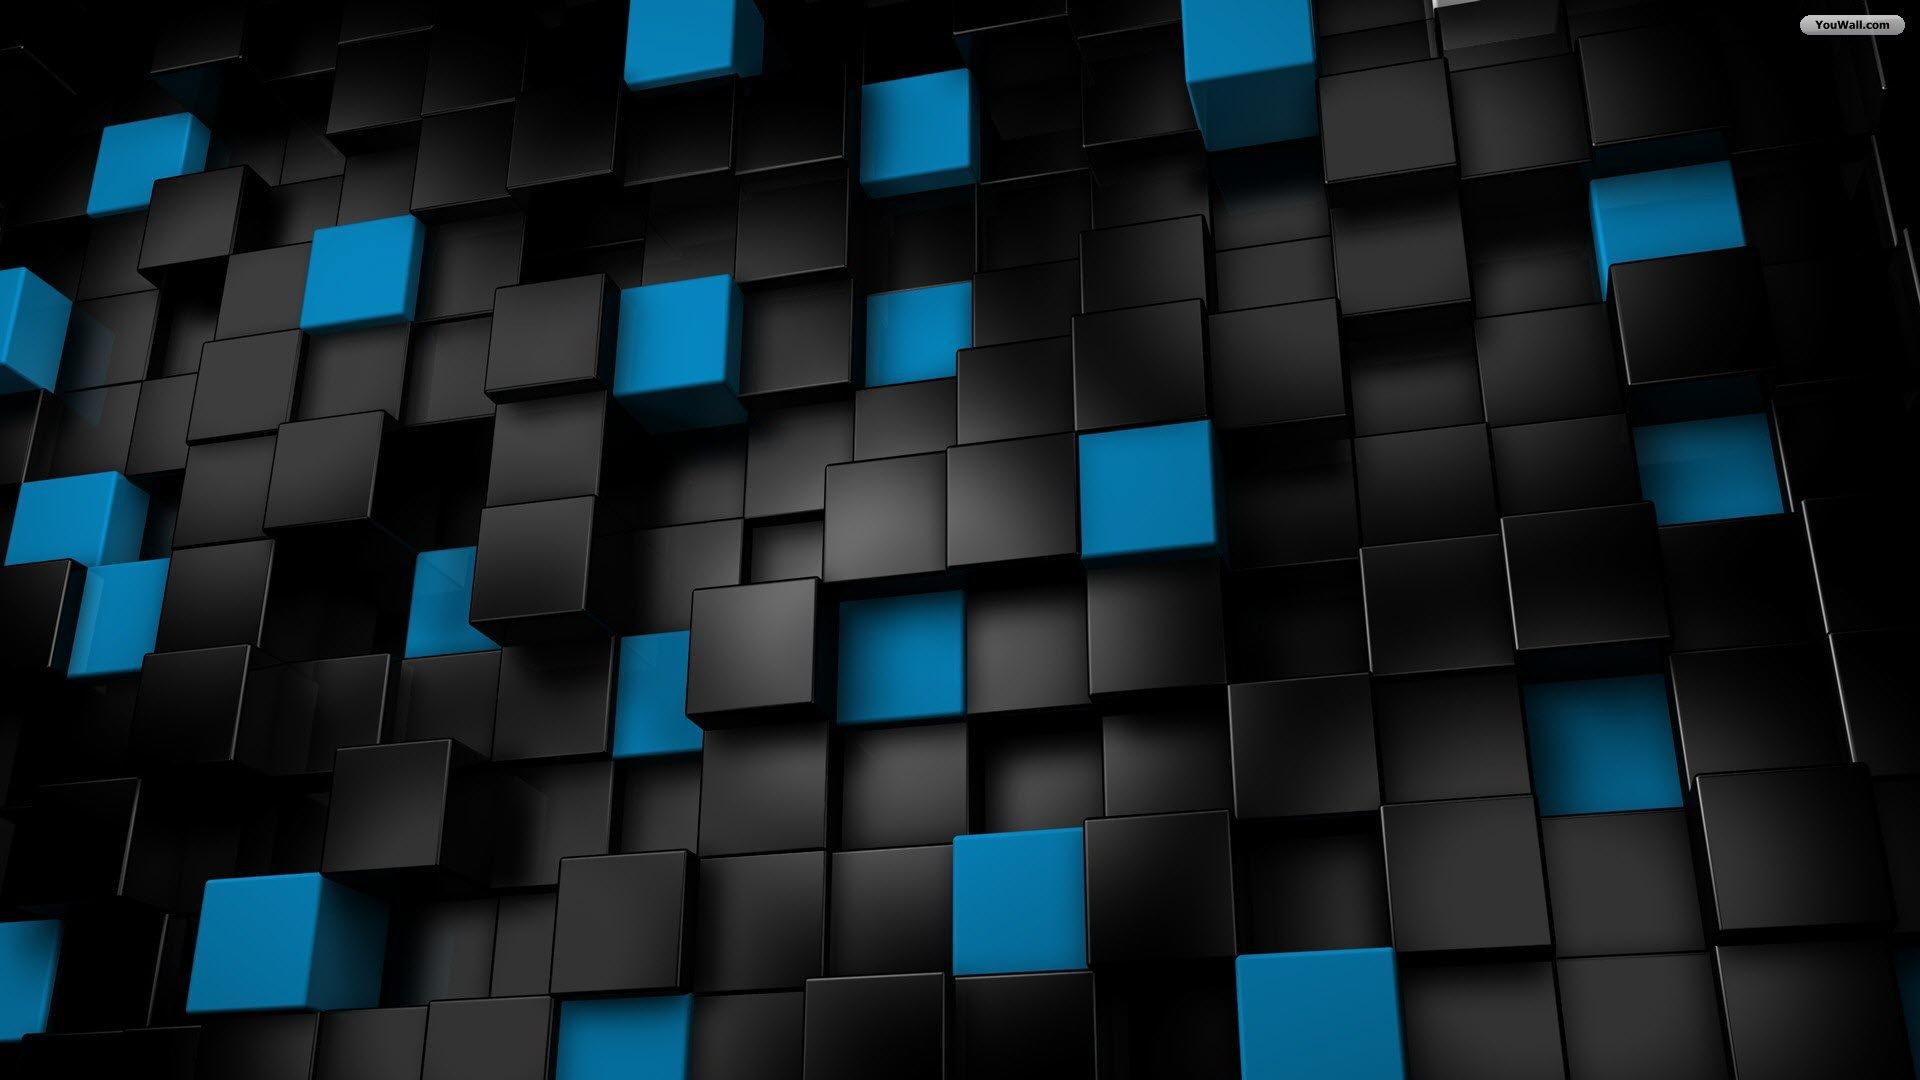 blue cubes desktop wallpaper download black and blue cubes wallpaper 1920x1080